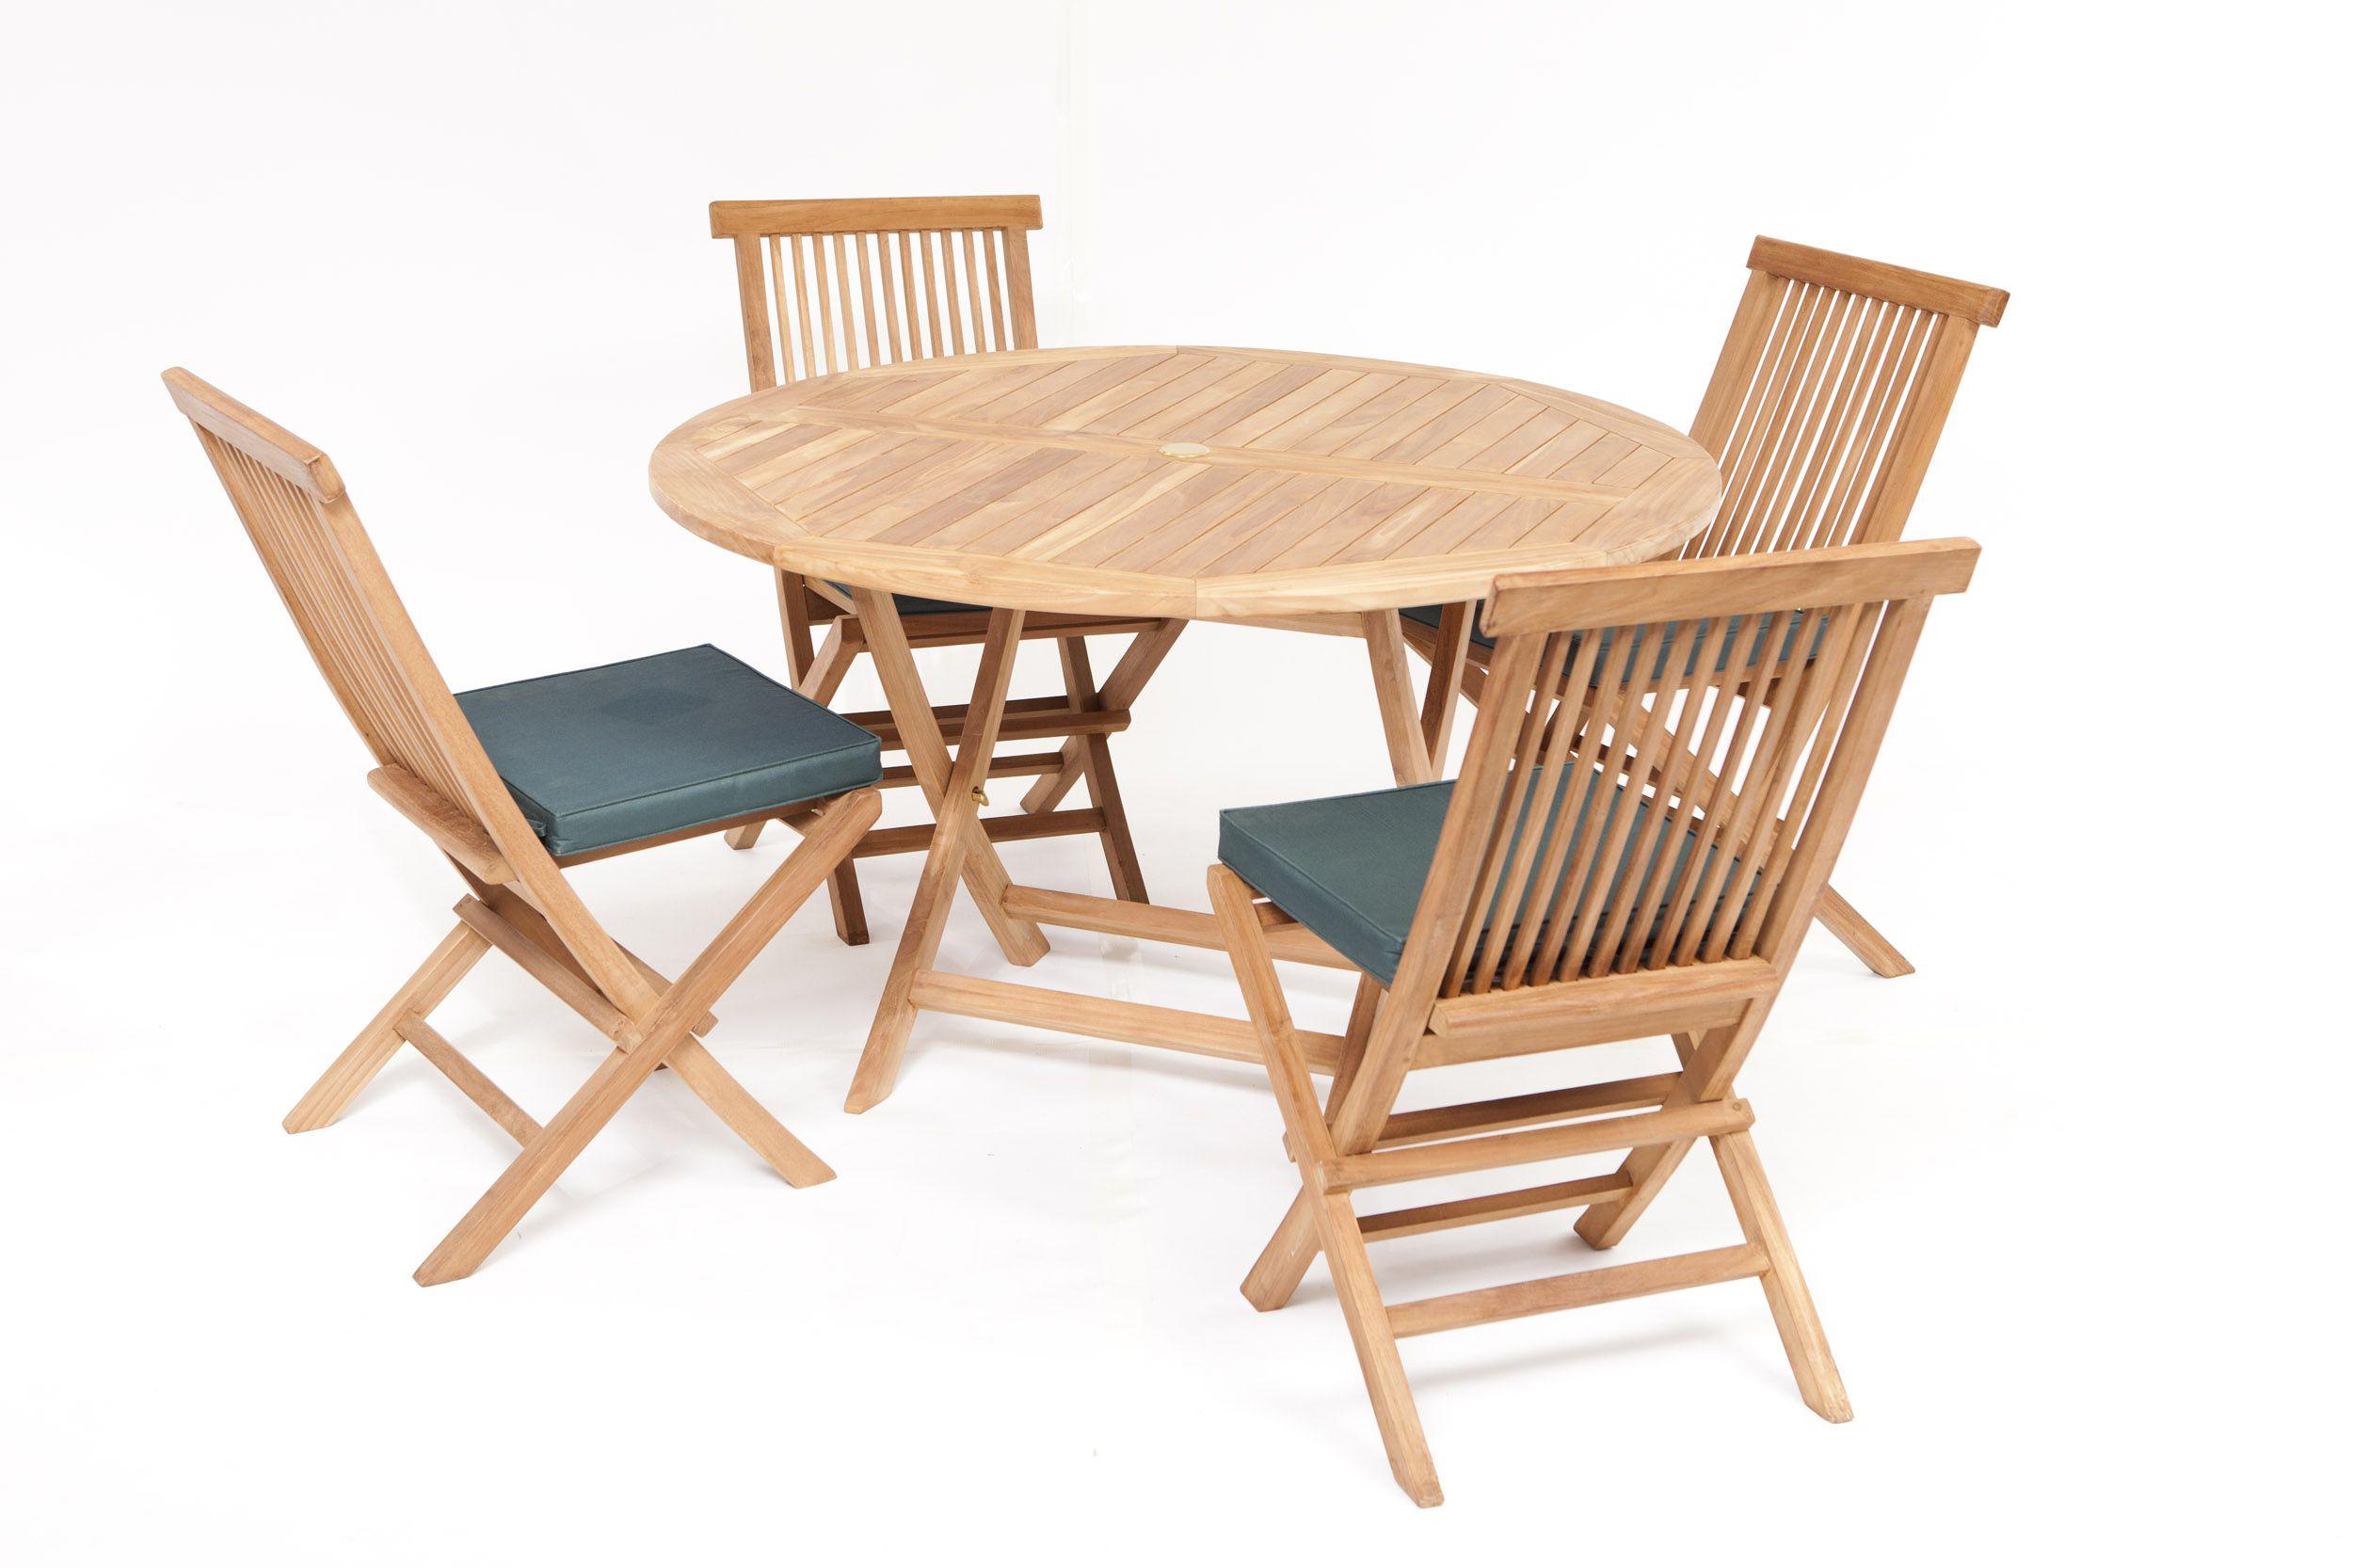 Small Folding Dining Table Biarritz Teak Garden Furniture Dining Set Humber Imports